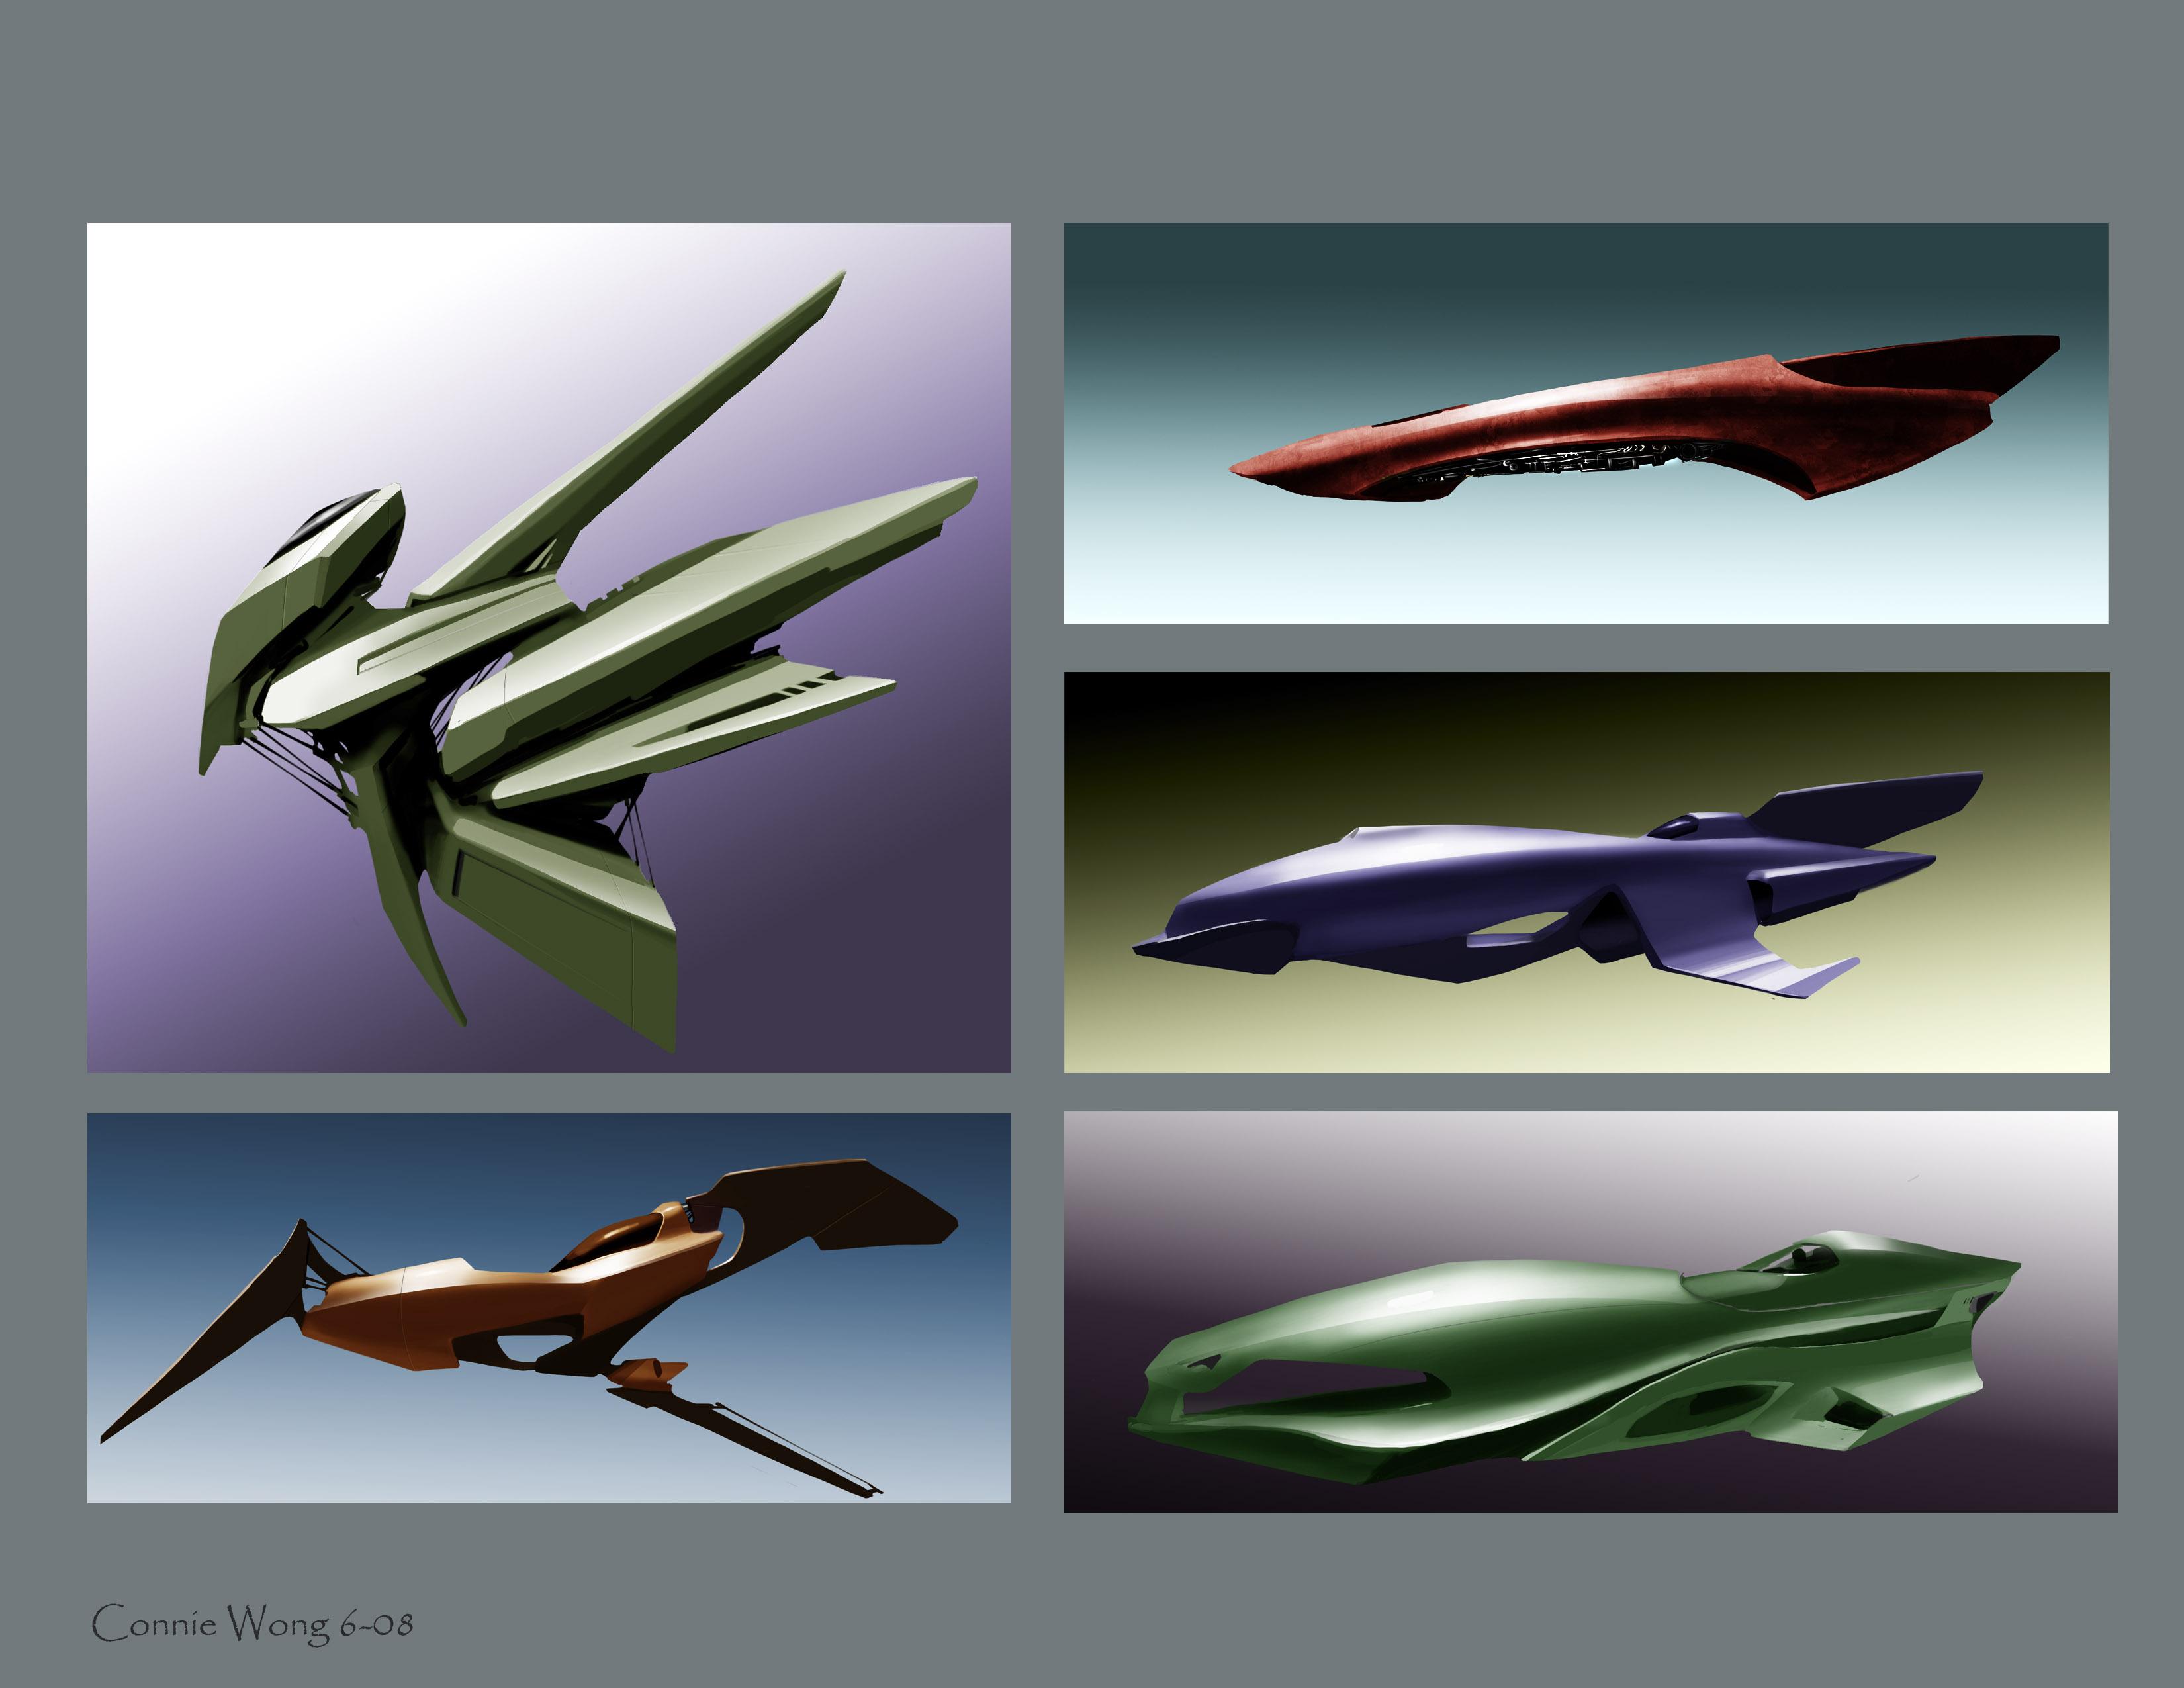 space ship designs